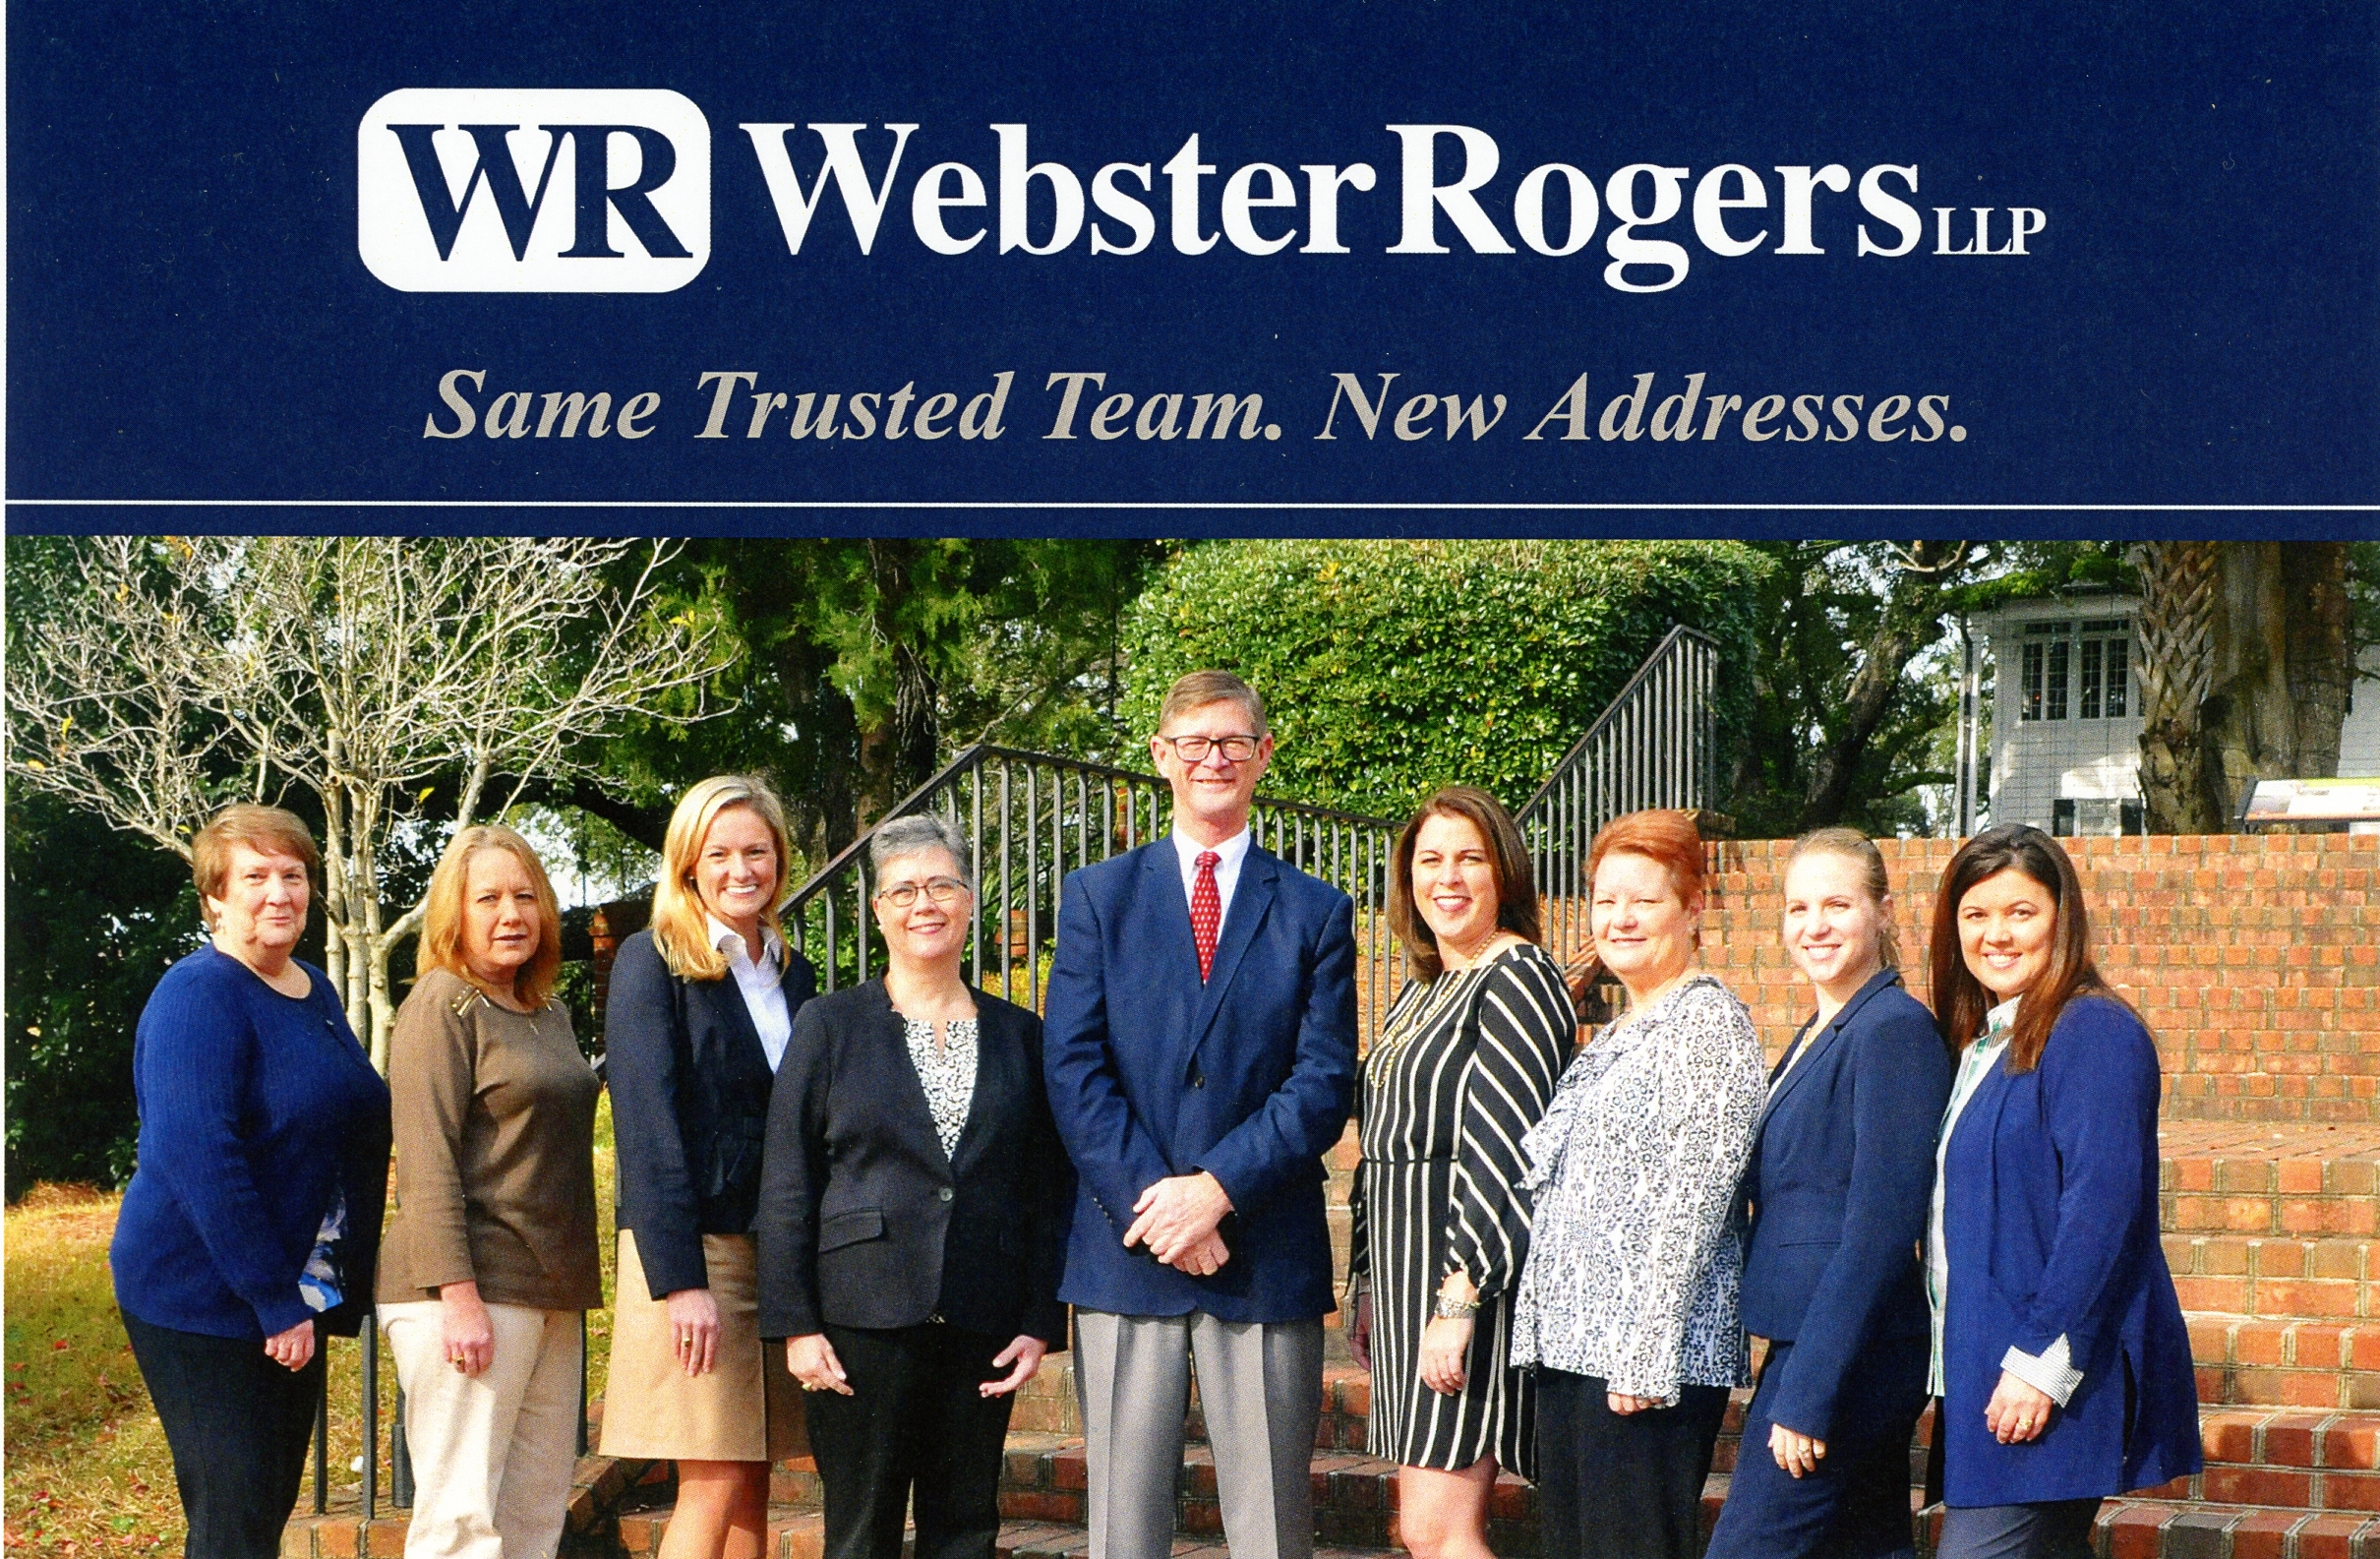 Webster Rogers001.jpg